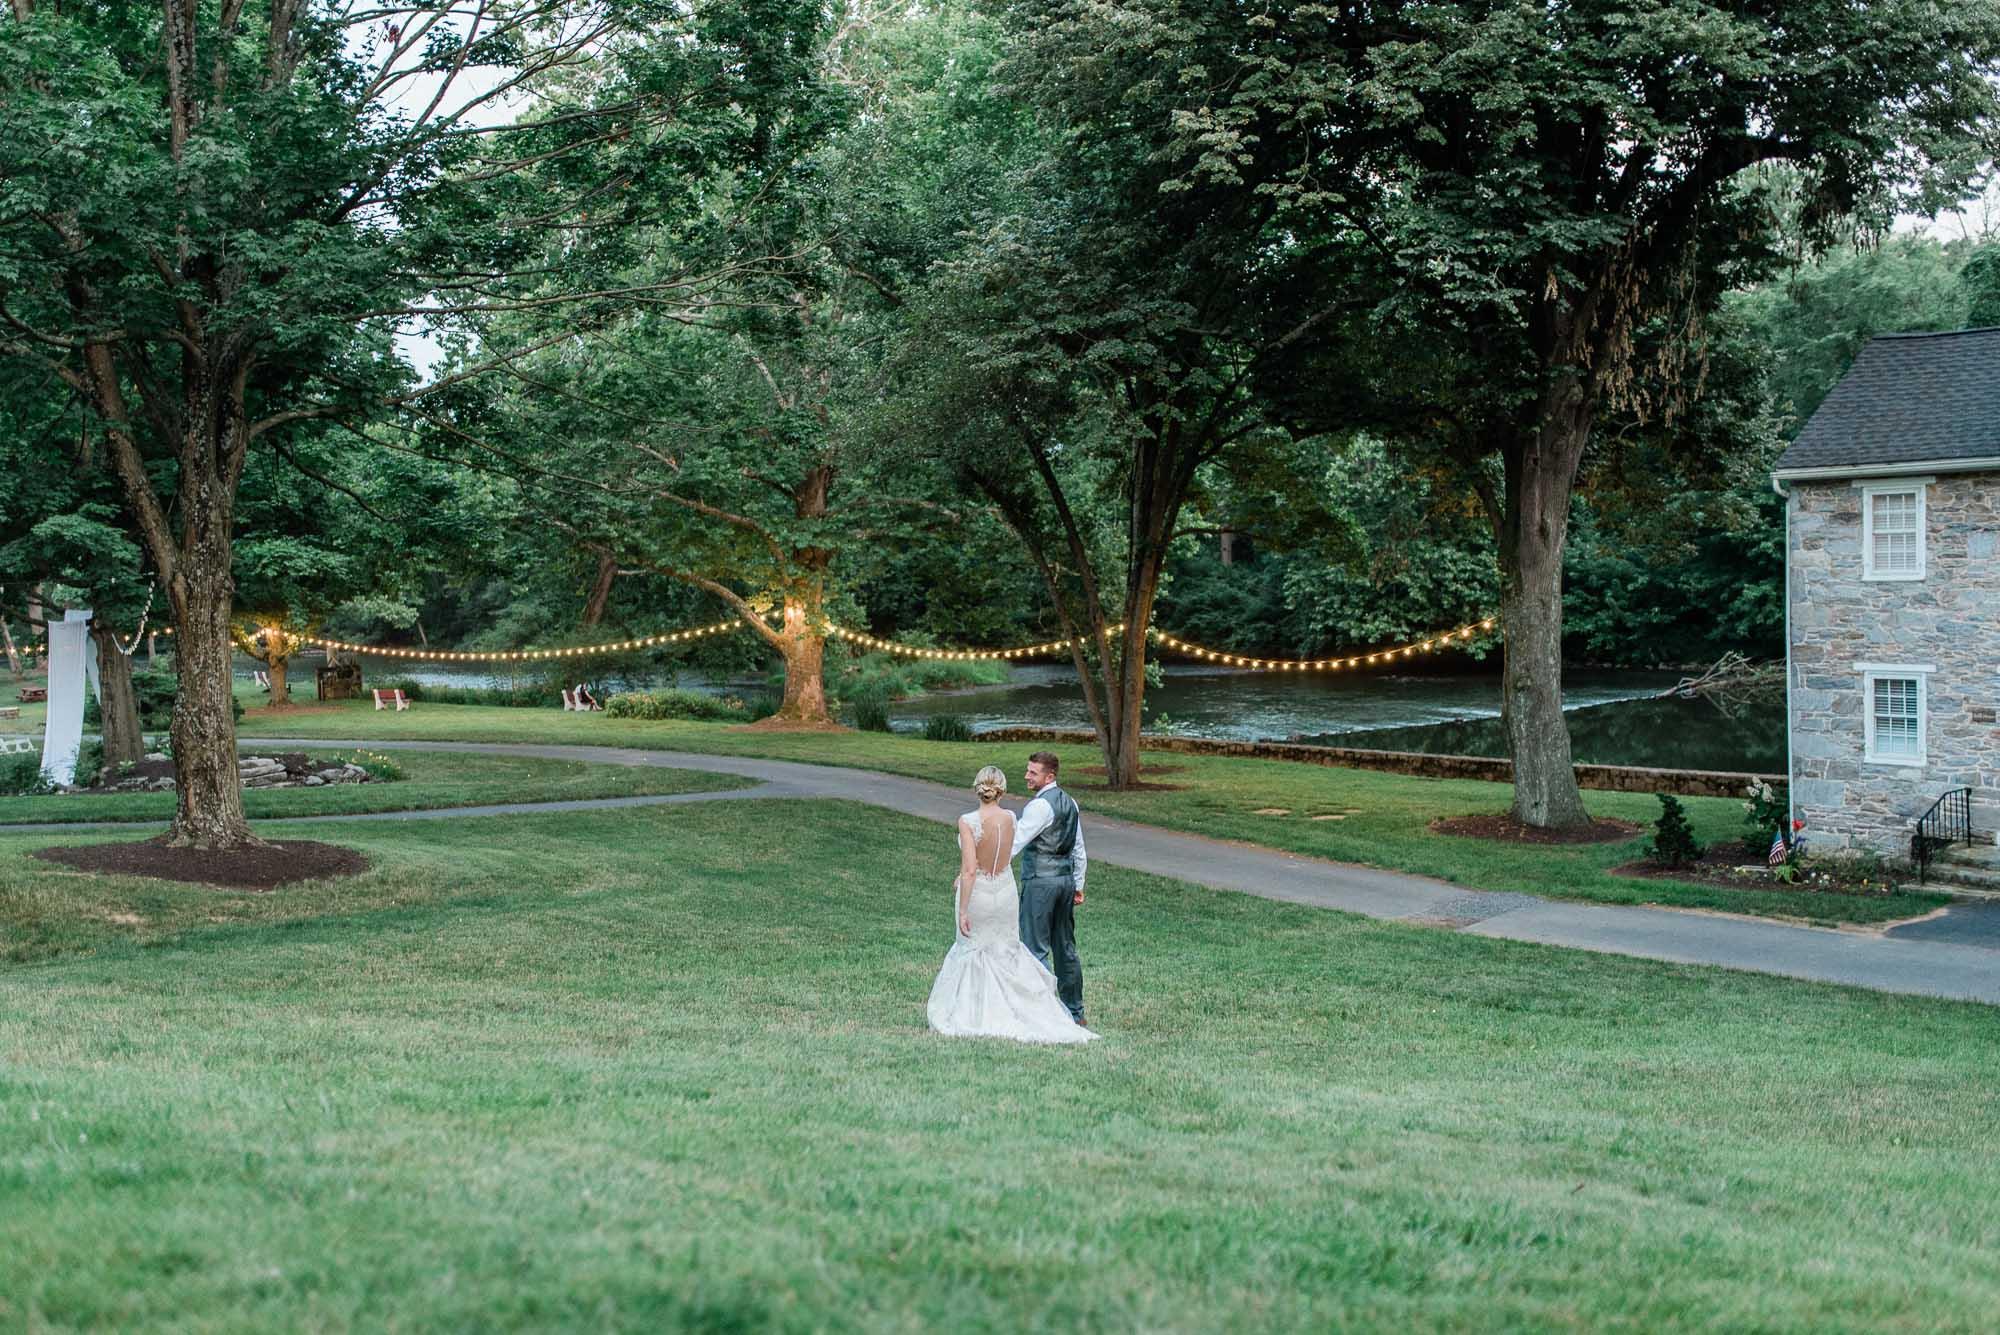 Allenberry-resort-historic-pennsylvania-wedding-1891.jpg